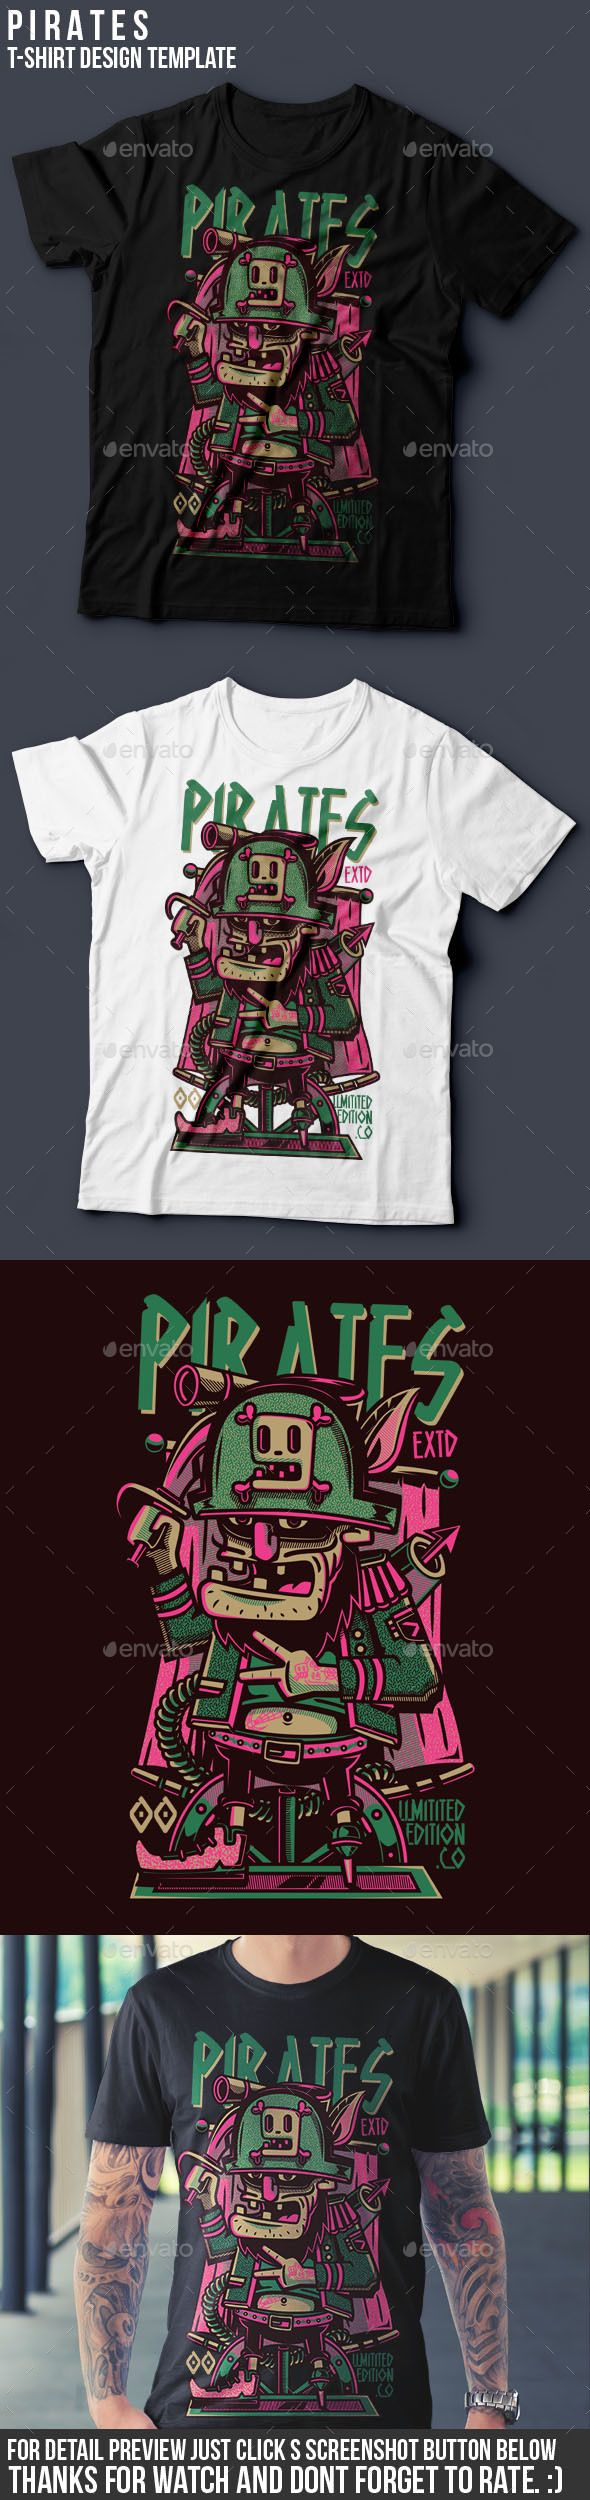 Pirates TShirt Design  #ai #illustrator #tees #pirates • Download ➝ https://graphicriver.net/item/pirates-tshirt-design/18789914?ref=pxcr